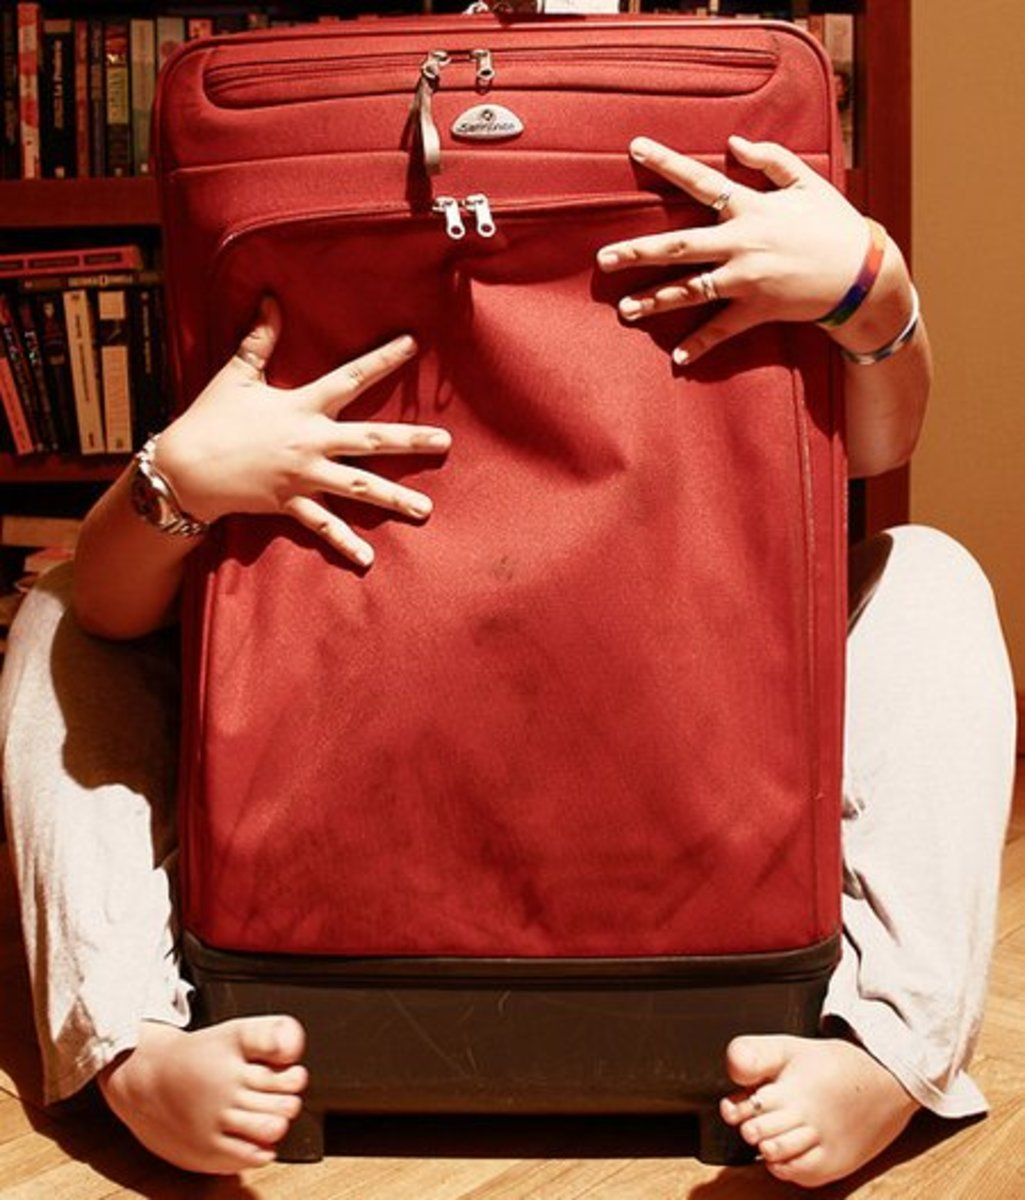 Torso in a Suitcase Costume